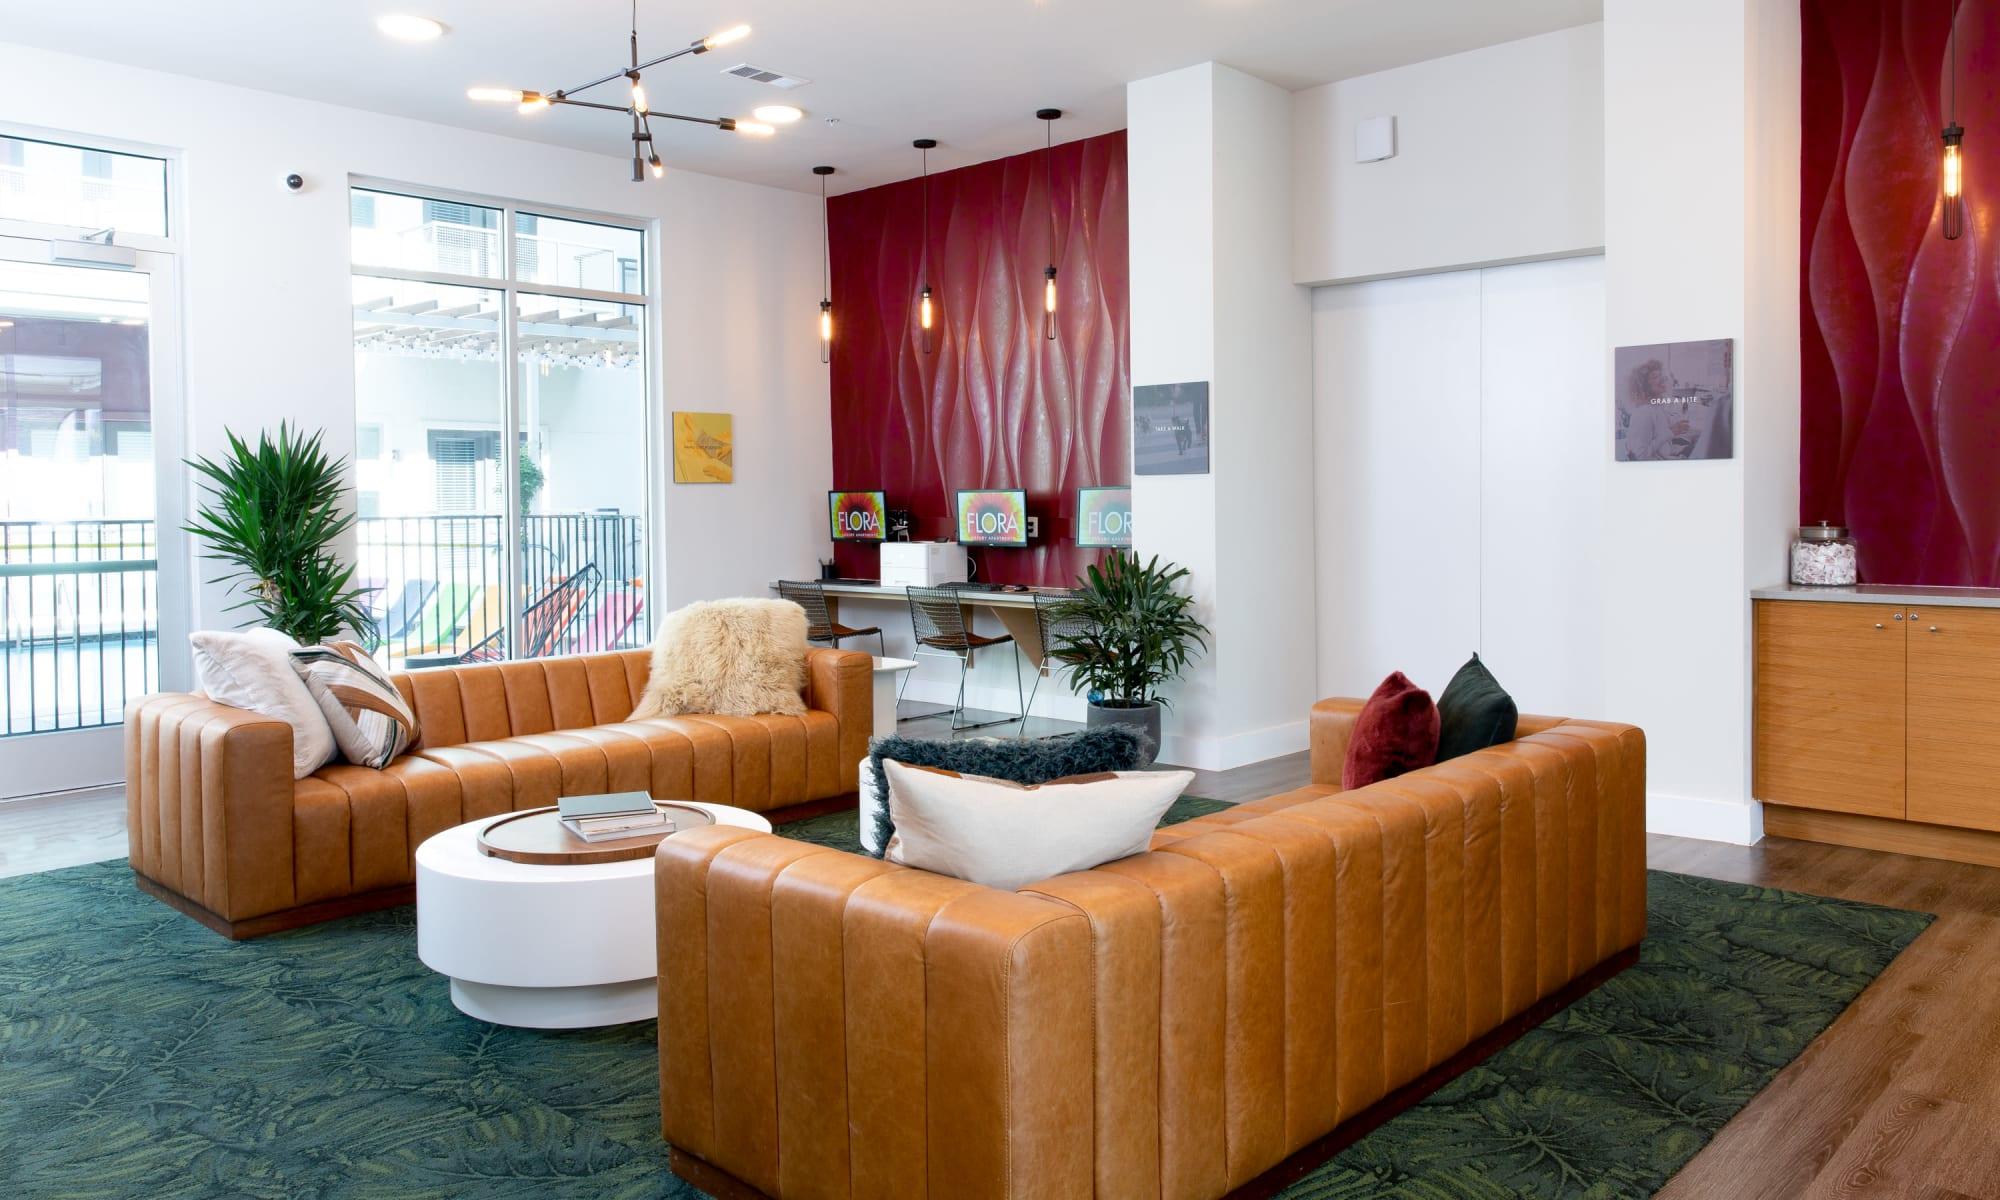 Apartments at Flora in Austin, Texas